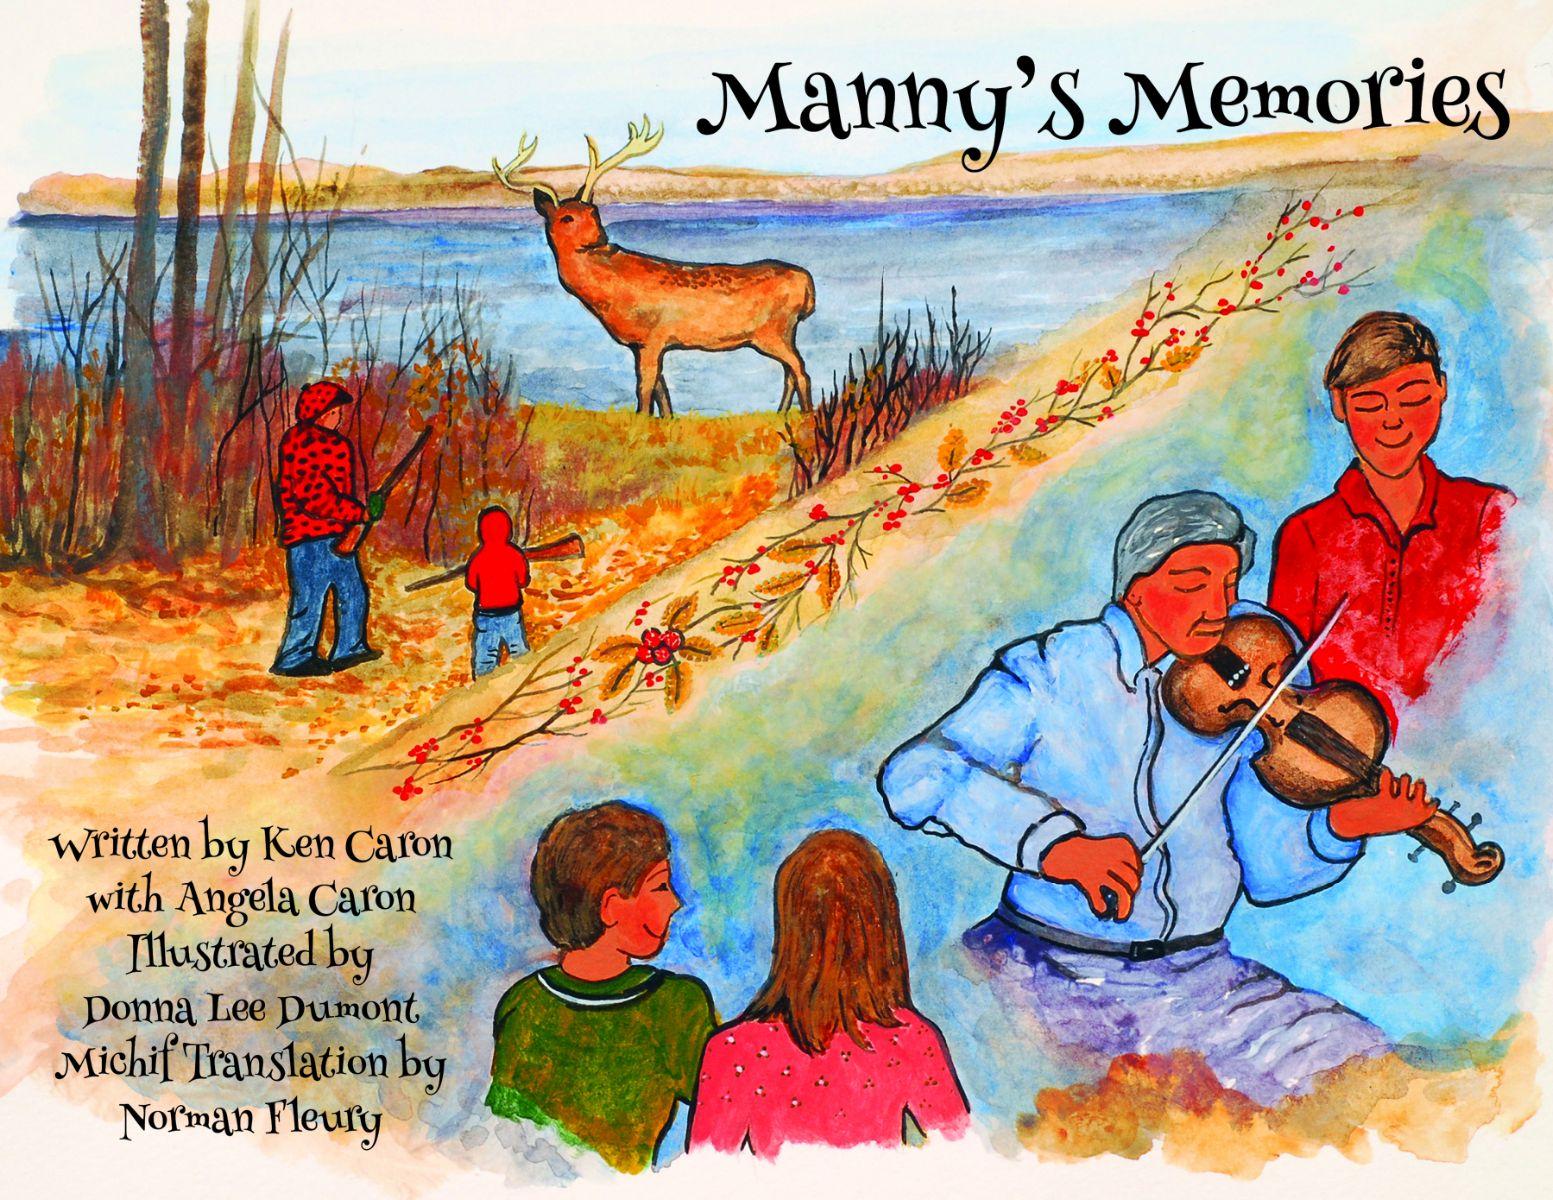 Manny's Memories